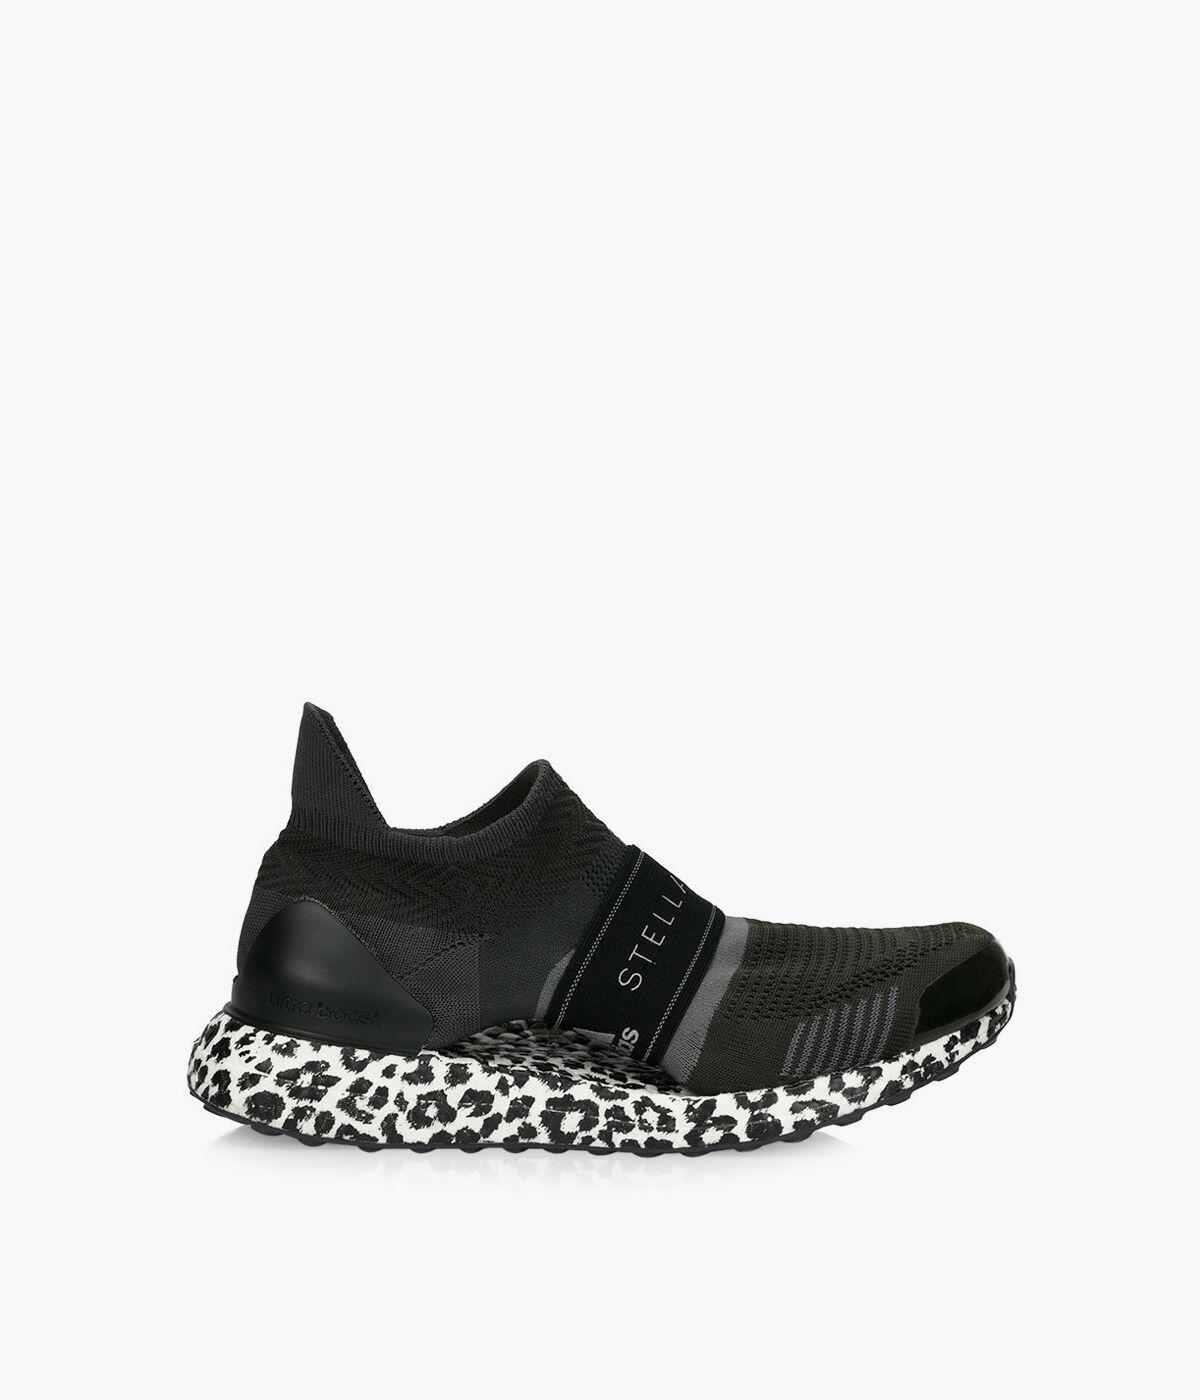 stella mccartney ultraboost x shoes